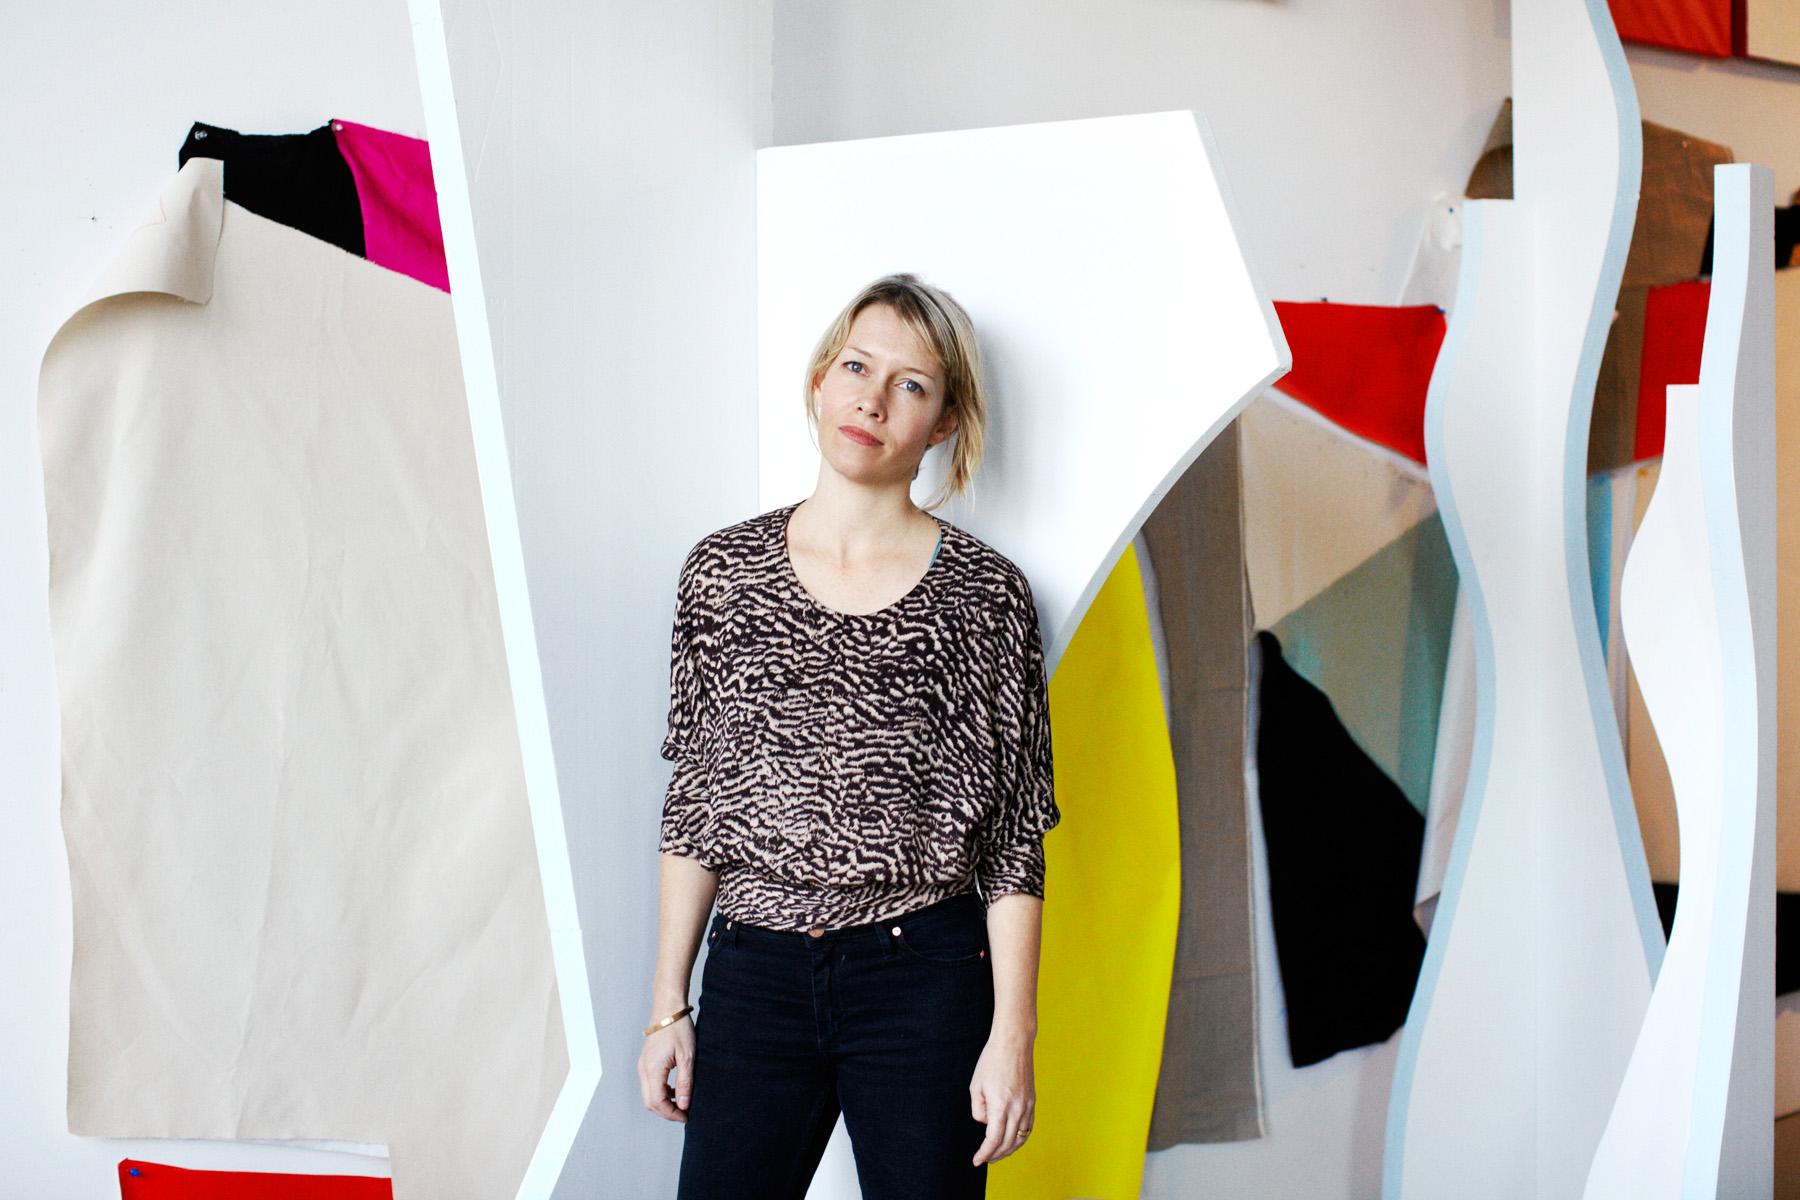 SARAH CROWNER | Artlover